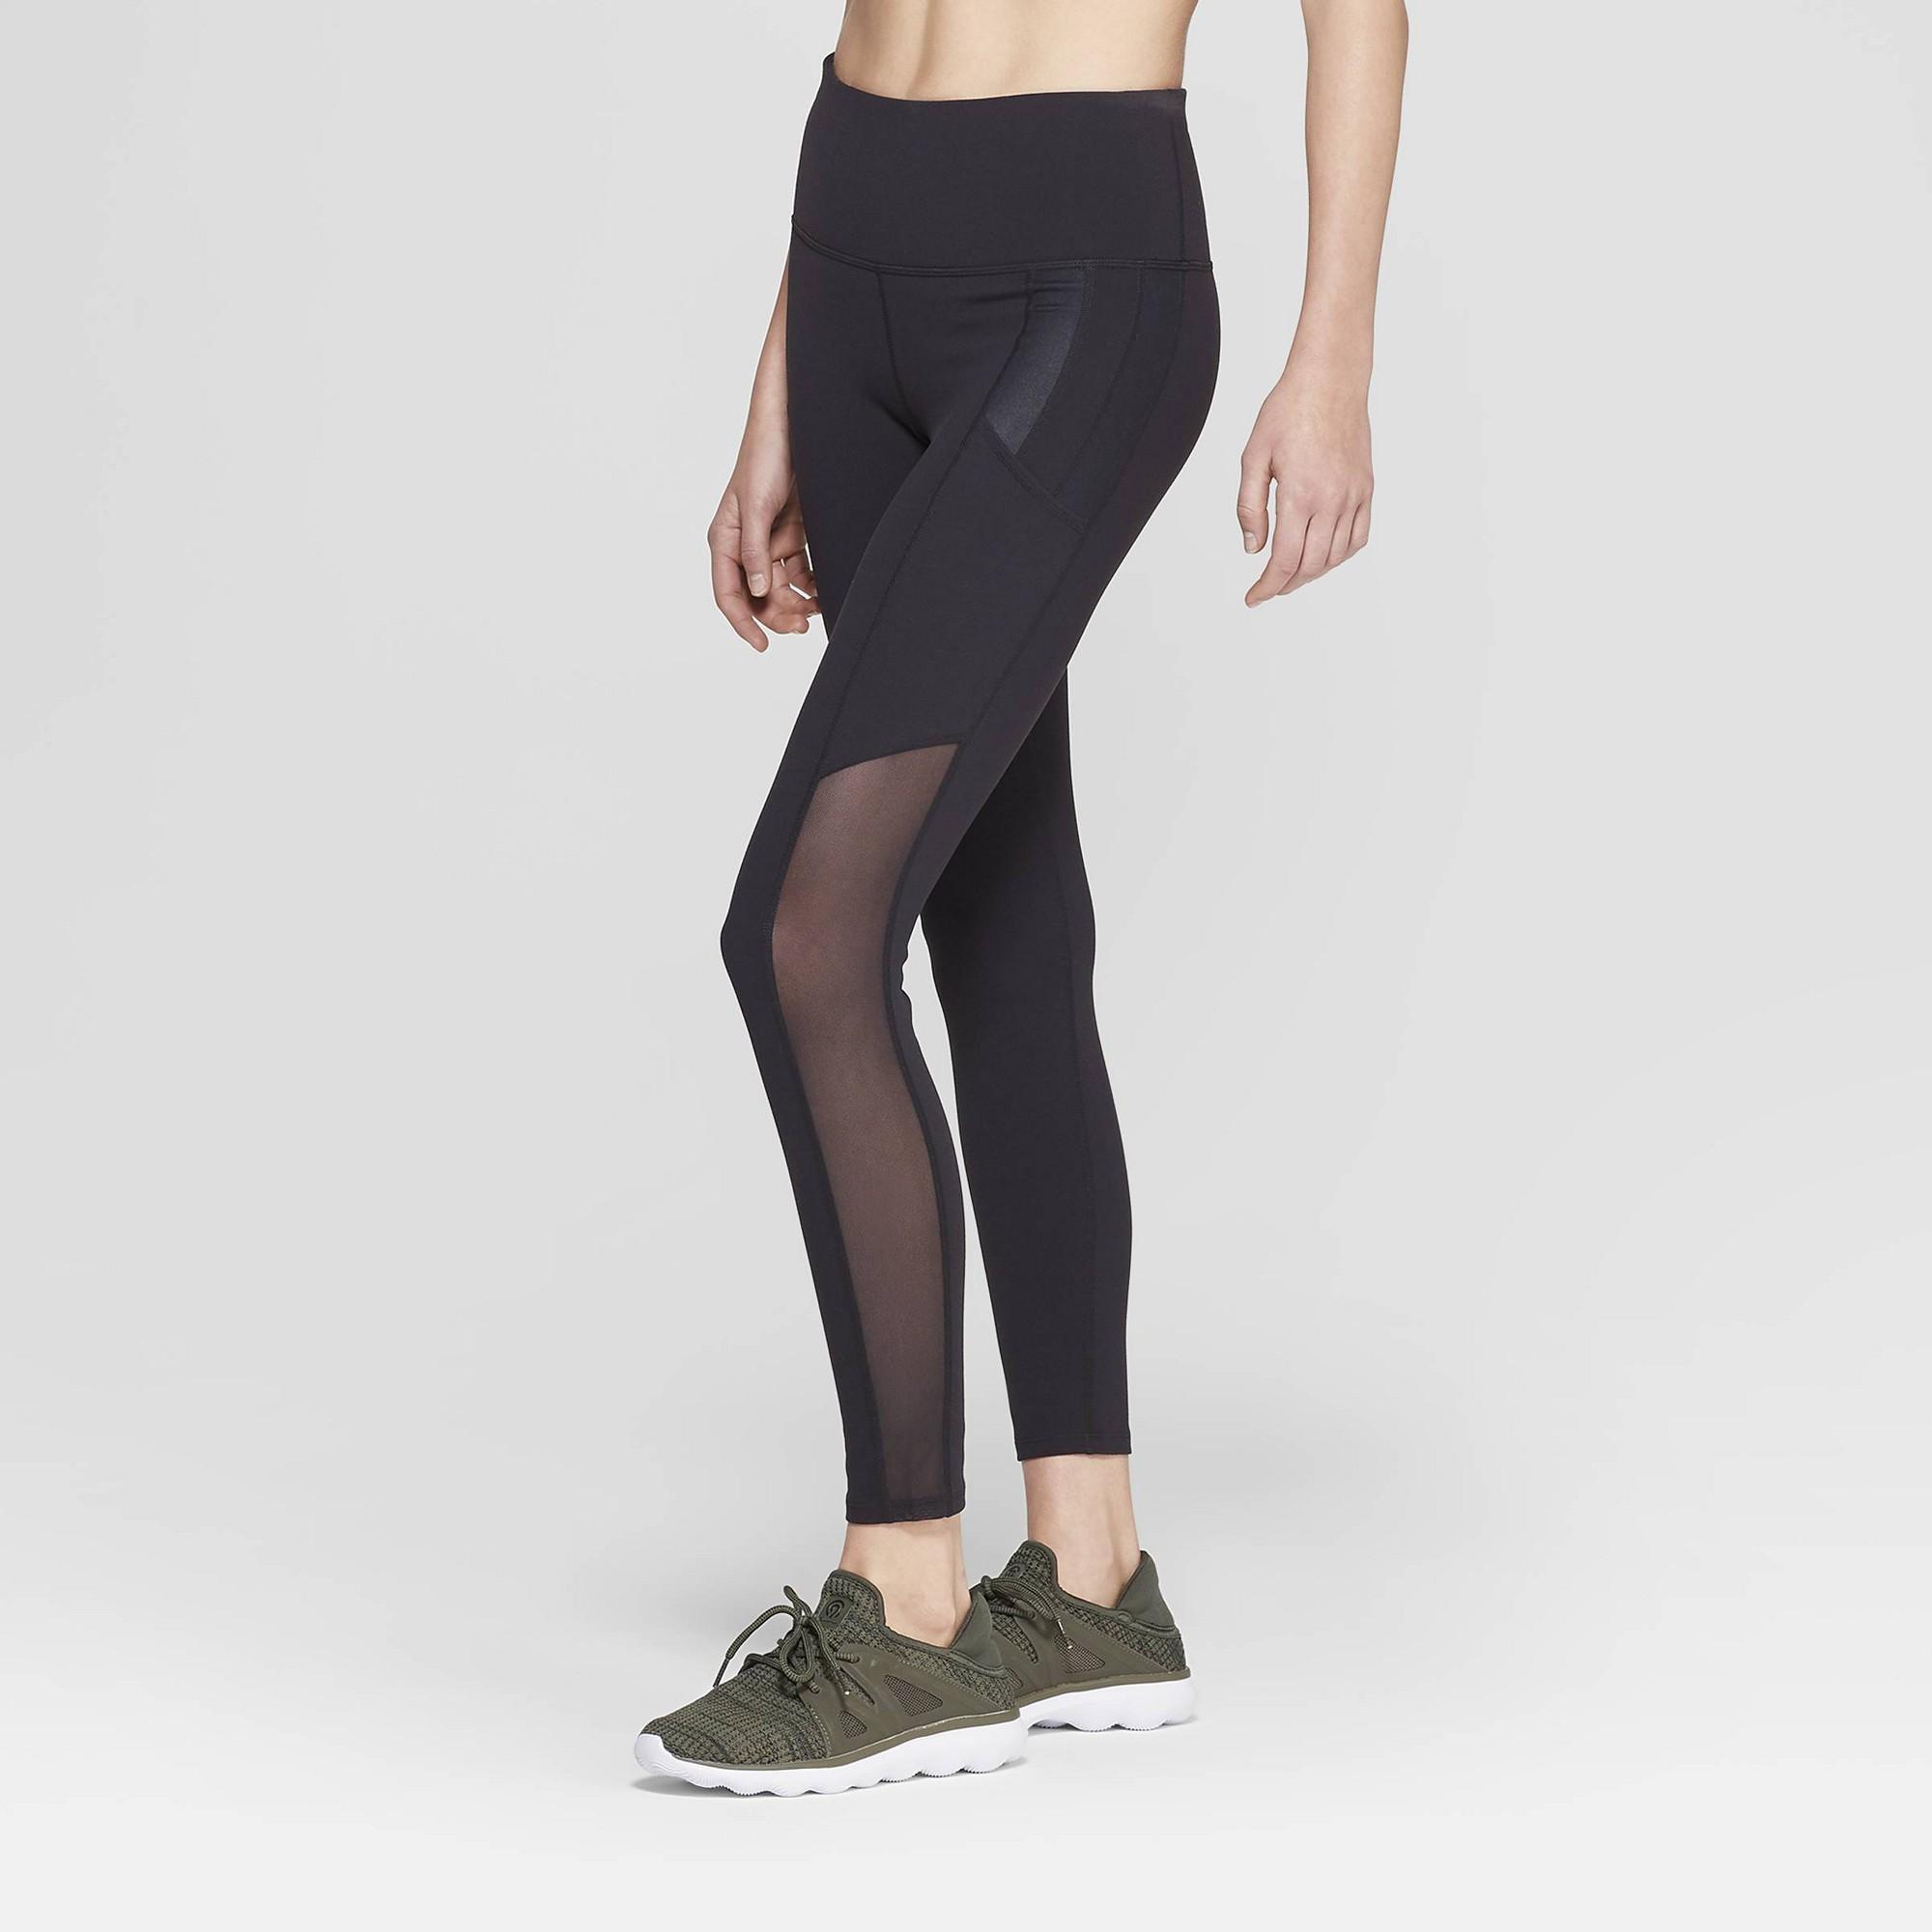 83d7f7de0a7a6 Women's Premium High-Waisted 7/8 Mesh Panel Leggings - JoyLab Black Xxl